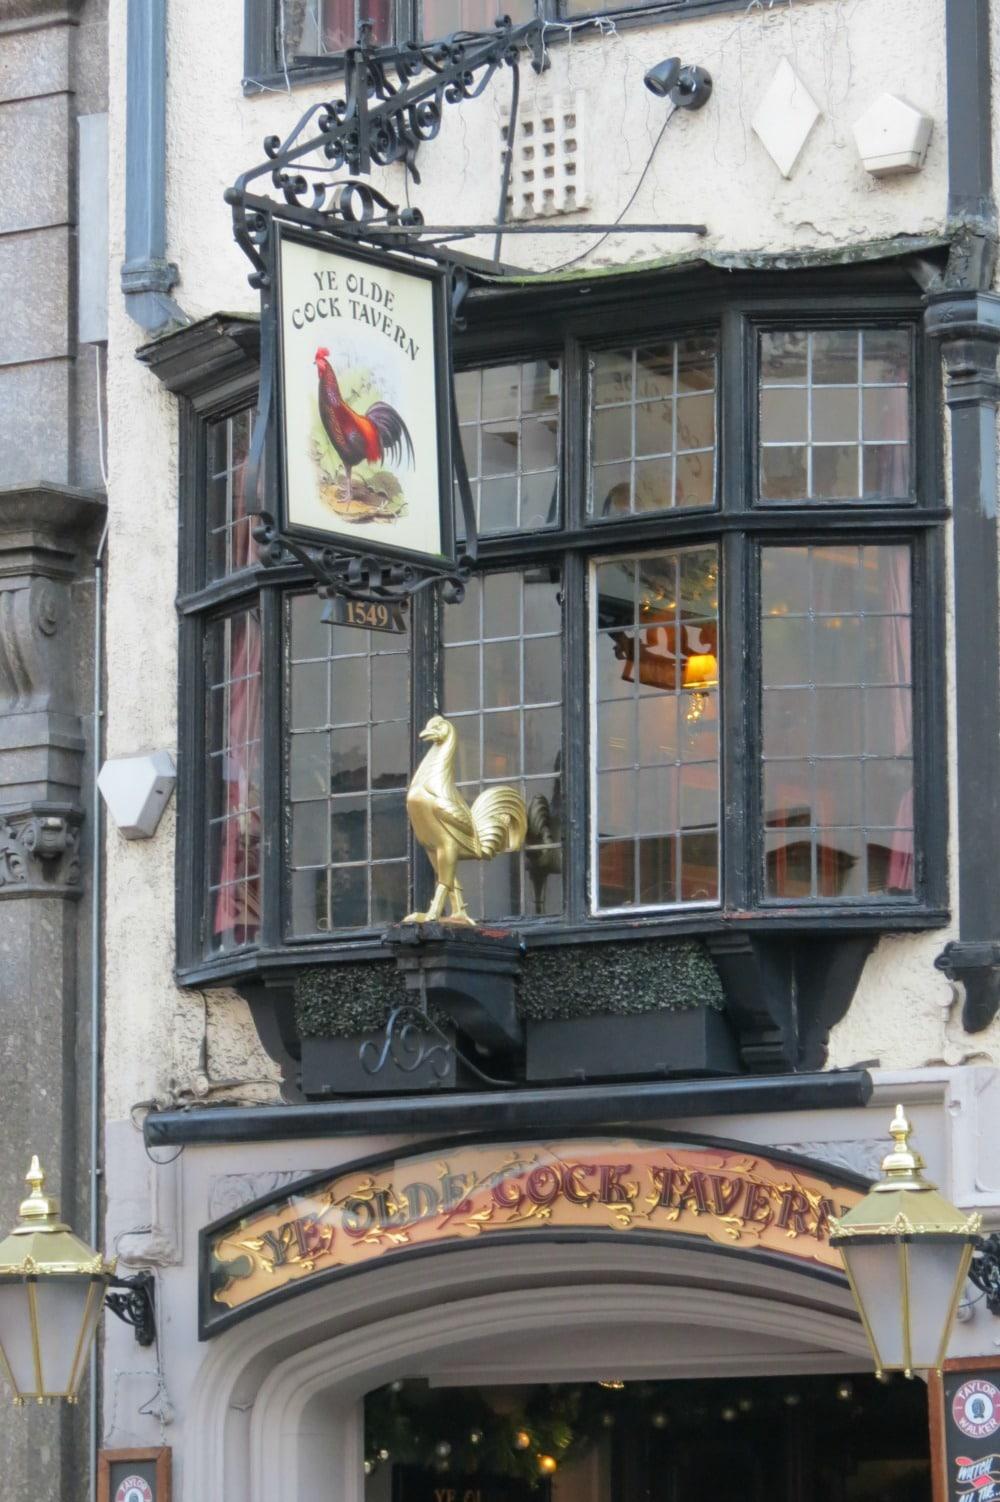 Baby Boomer Travel | England | Ye Olde Cock Tavern Pub